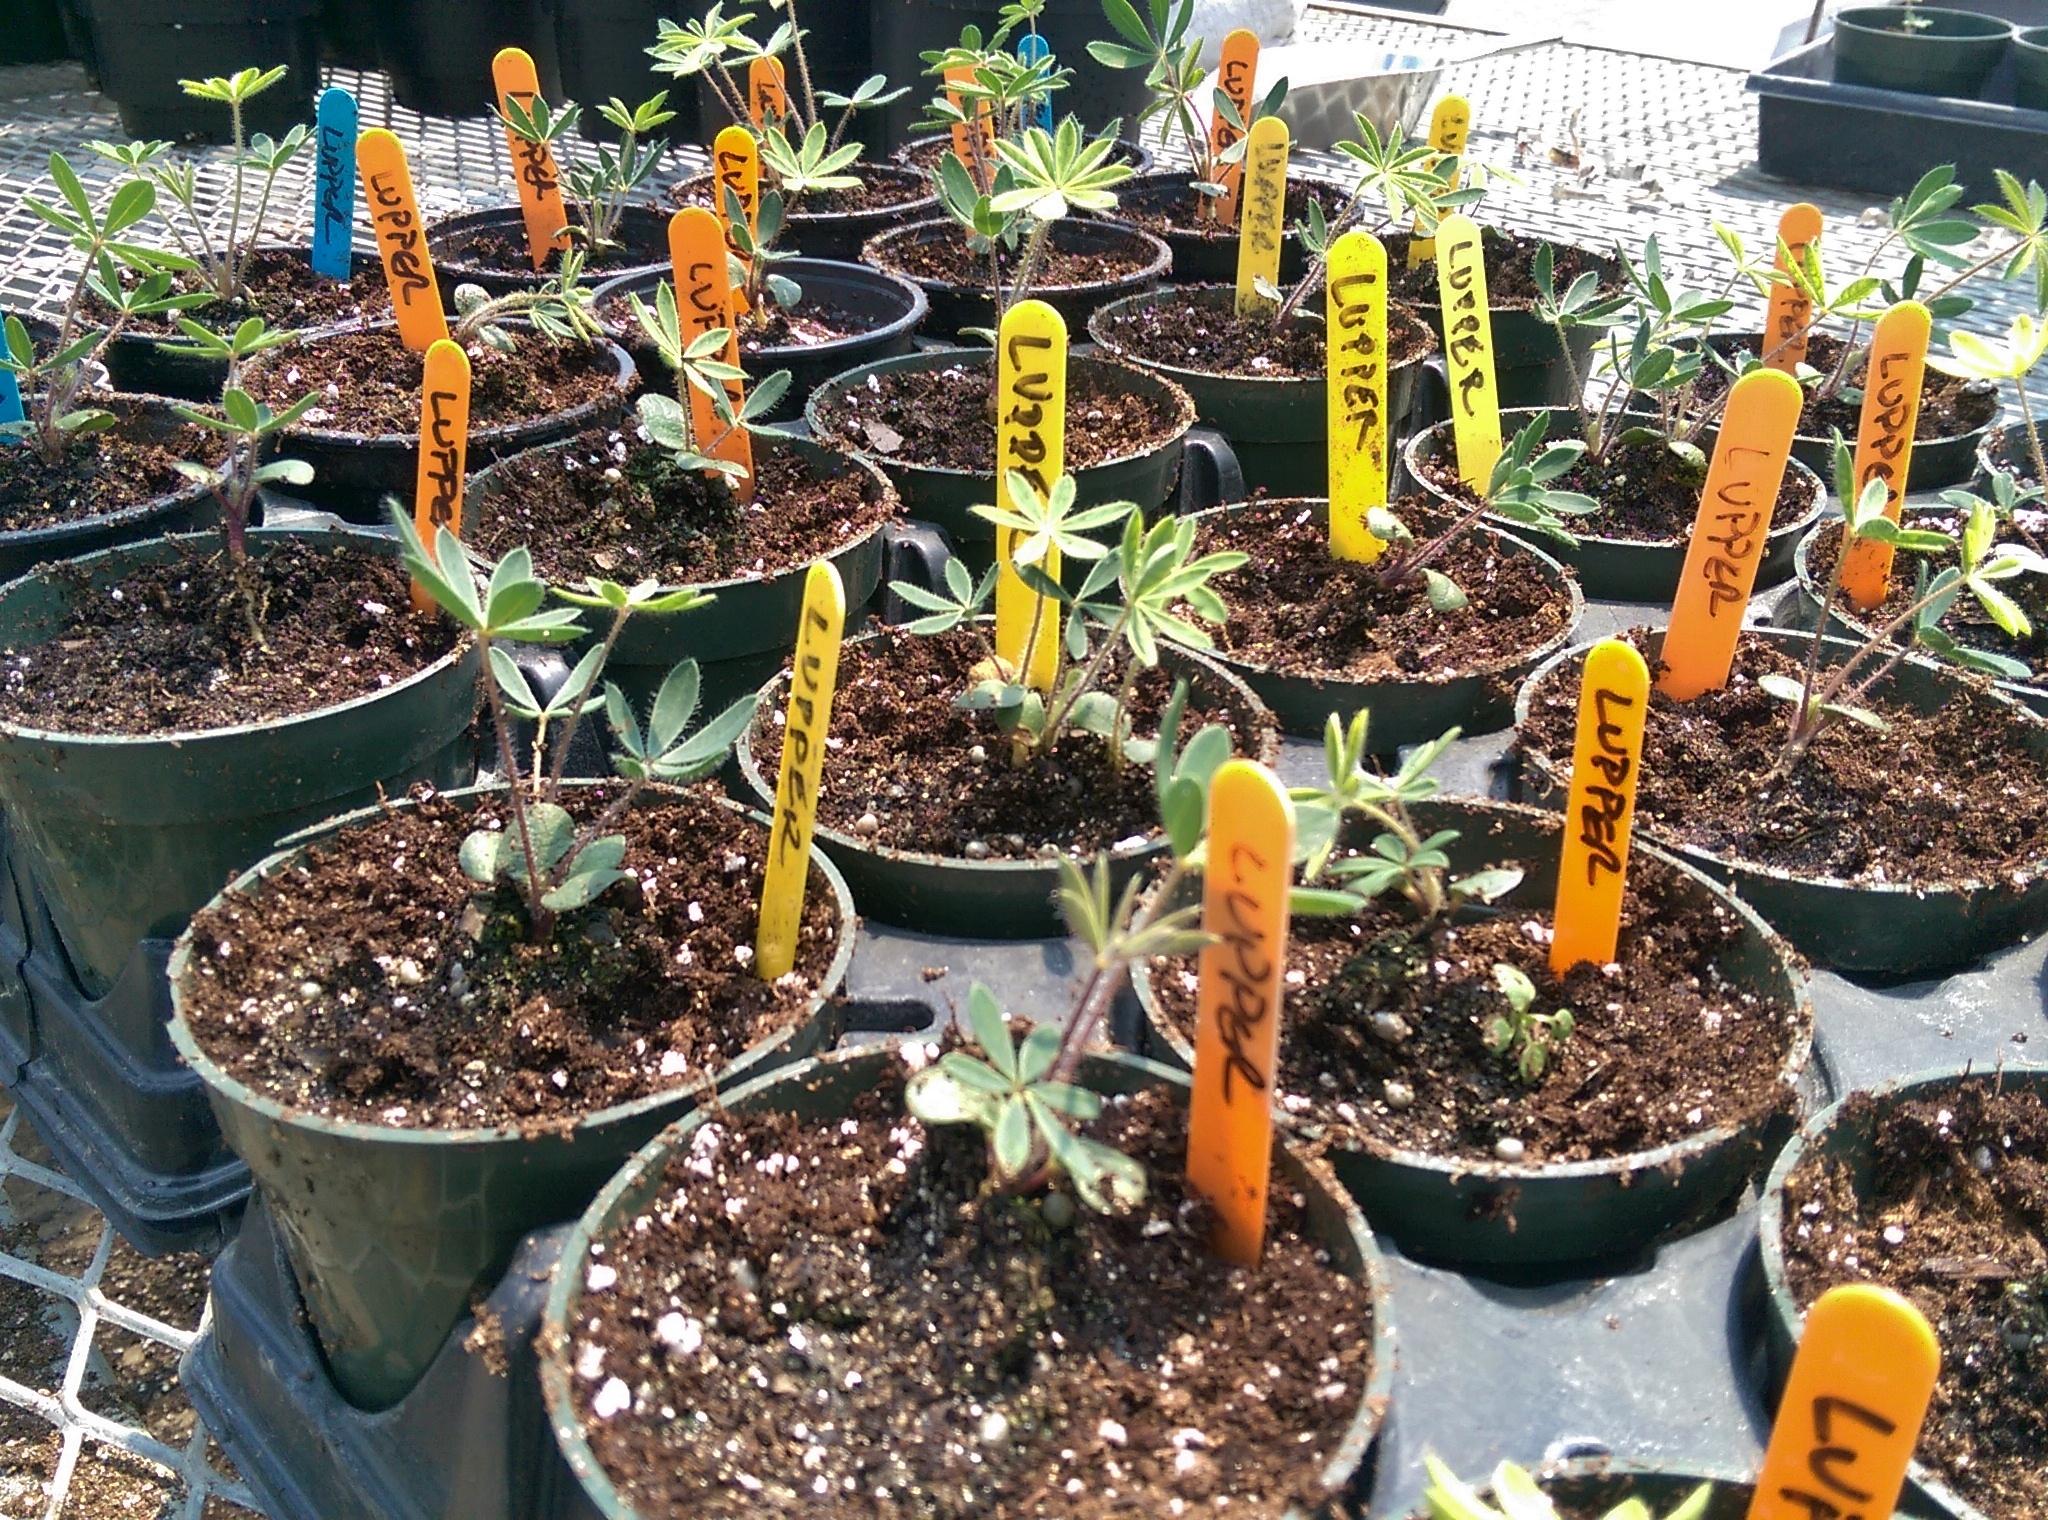 Lupines I transplanted for Toledo Metroparks